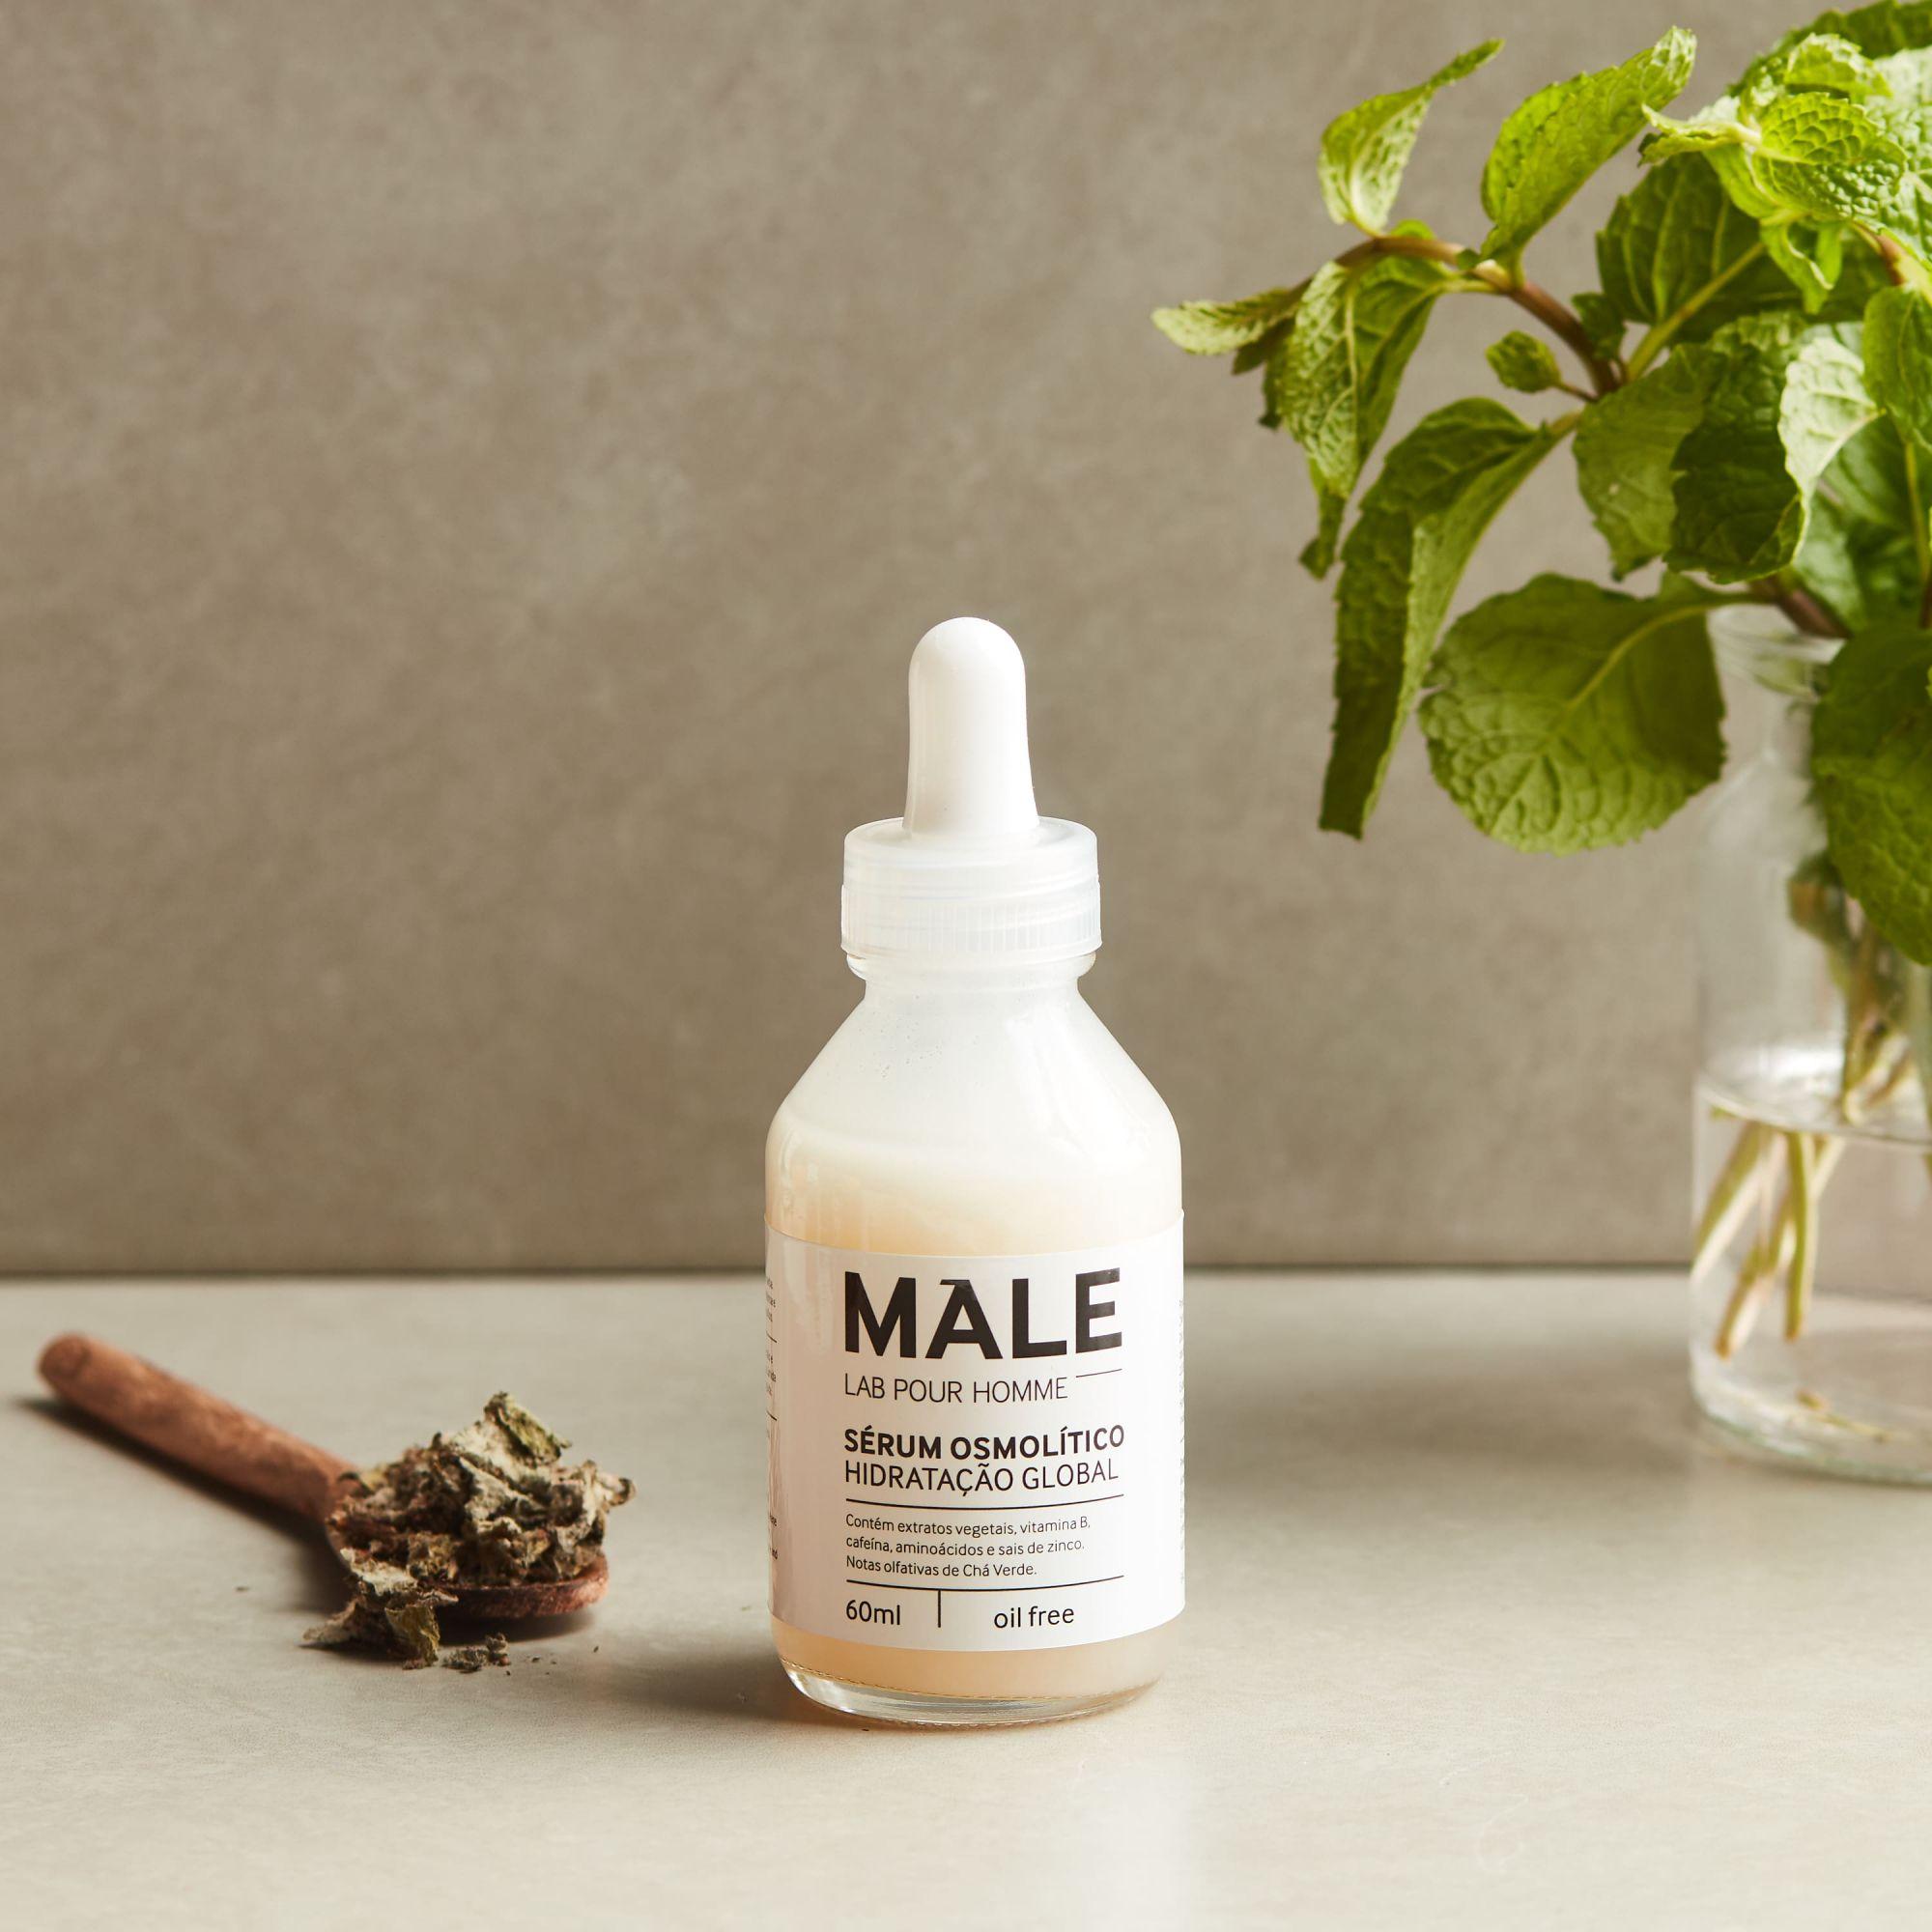 Sérum Osmolítico Hidratação Global (60ml) | Male Lab Pour Homme